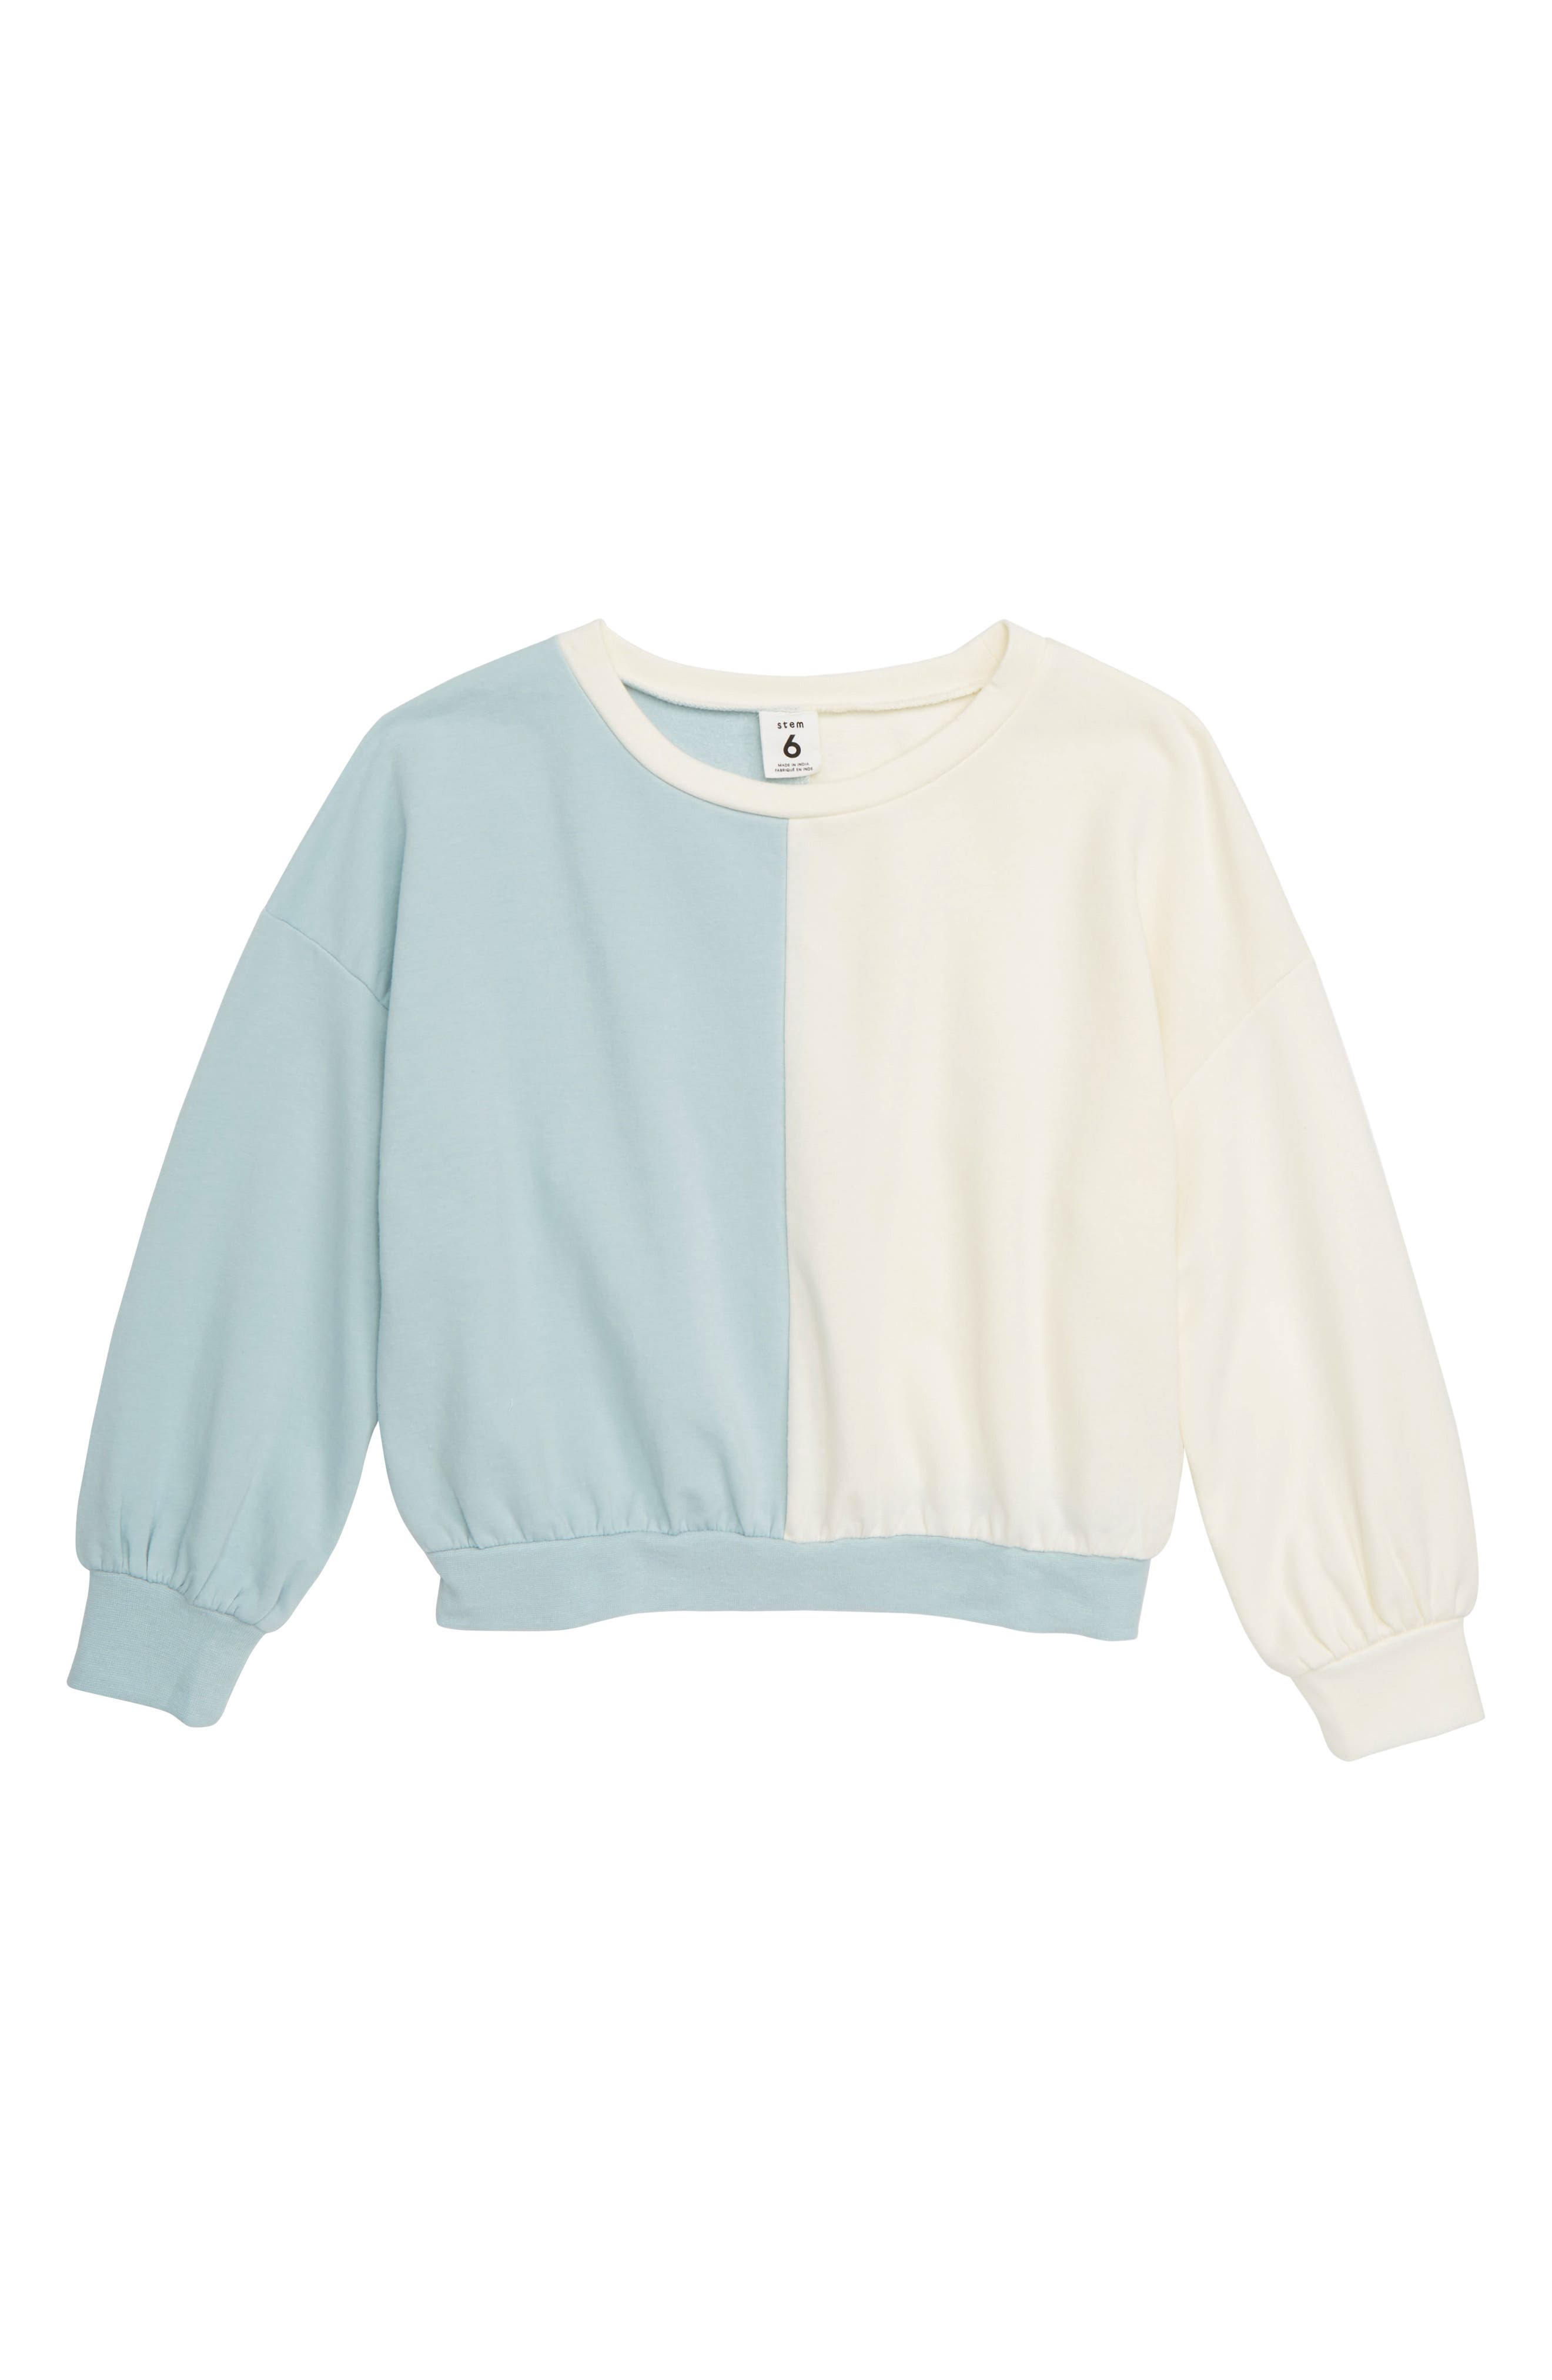 STEM Colorblock Sweatshirt, Main, color, 450